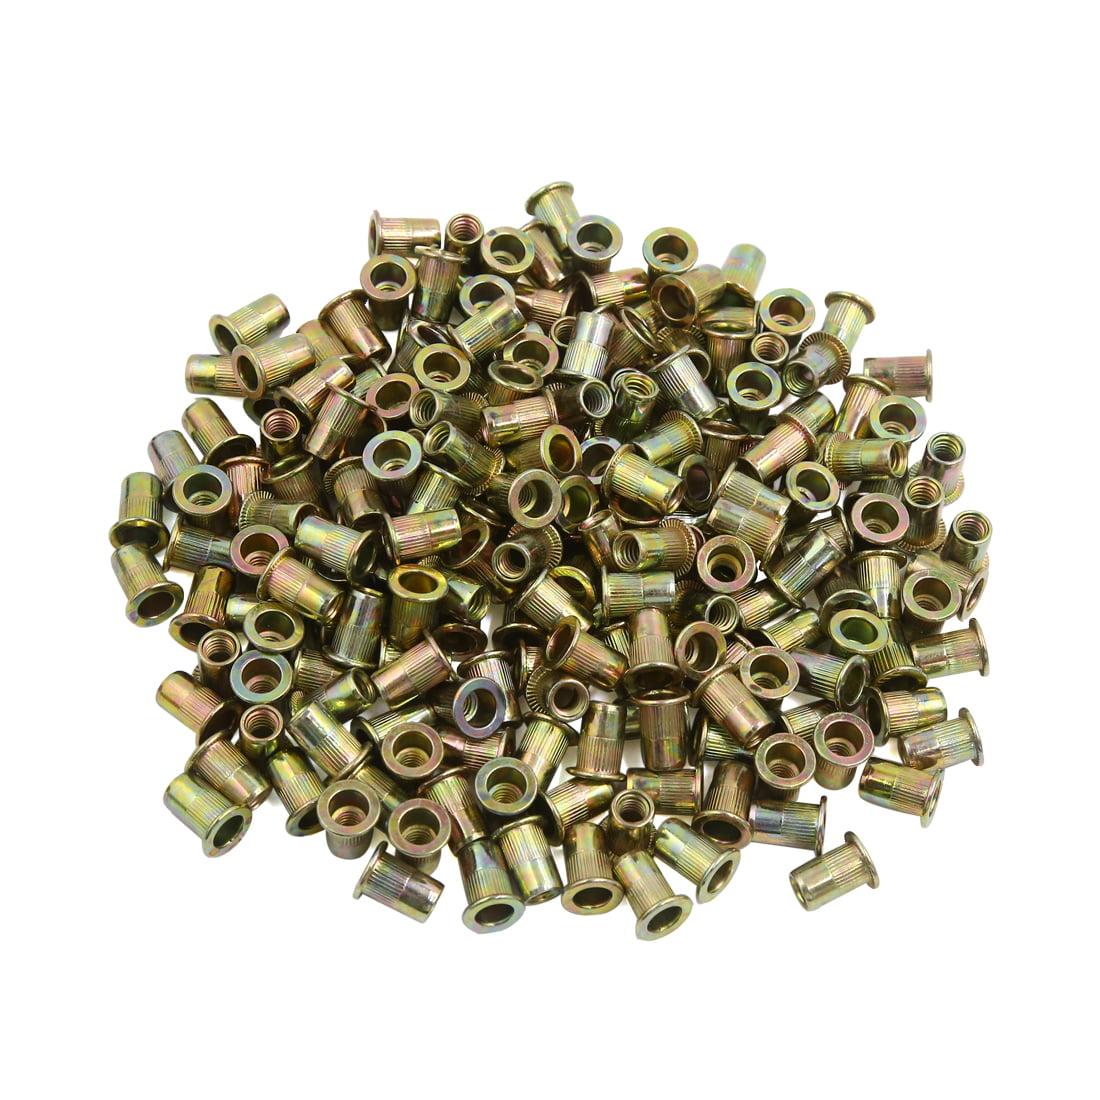 Pack of 5 1//2-13 Thread Size 4 Long Small Parts FSC504SHB Grade A Steel Square Head Bolt